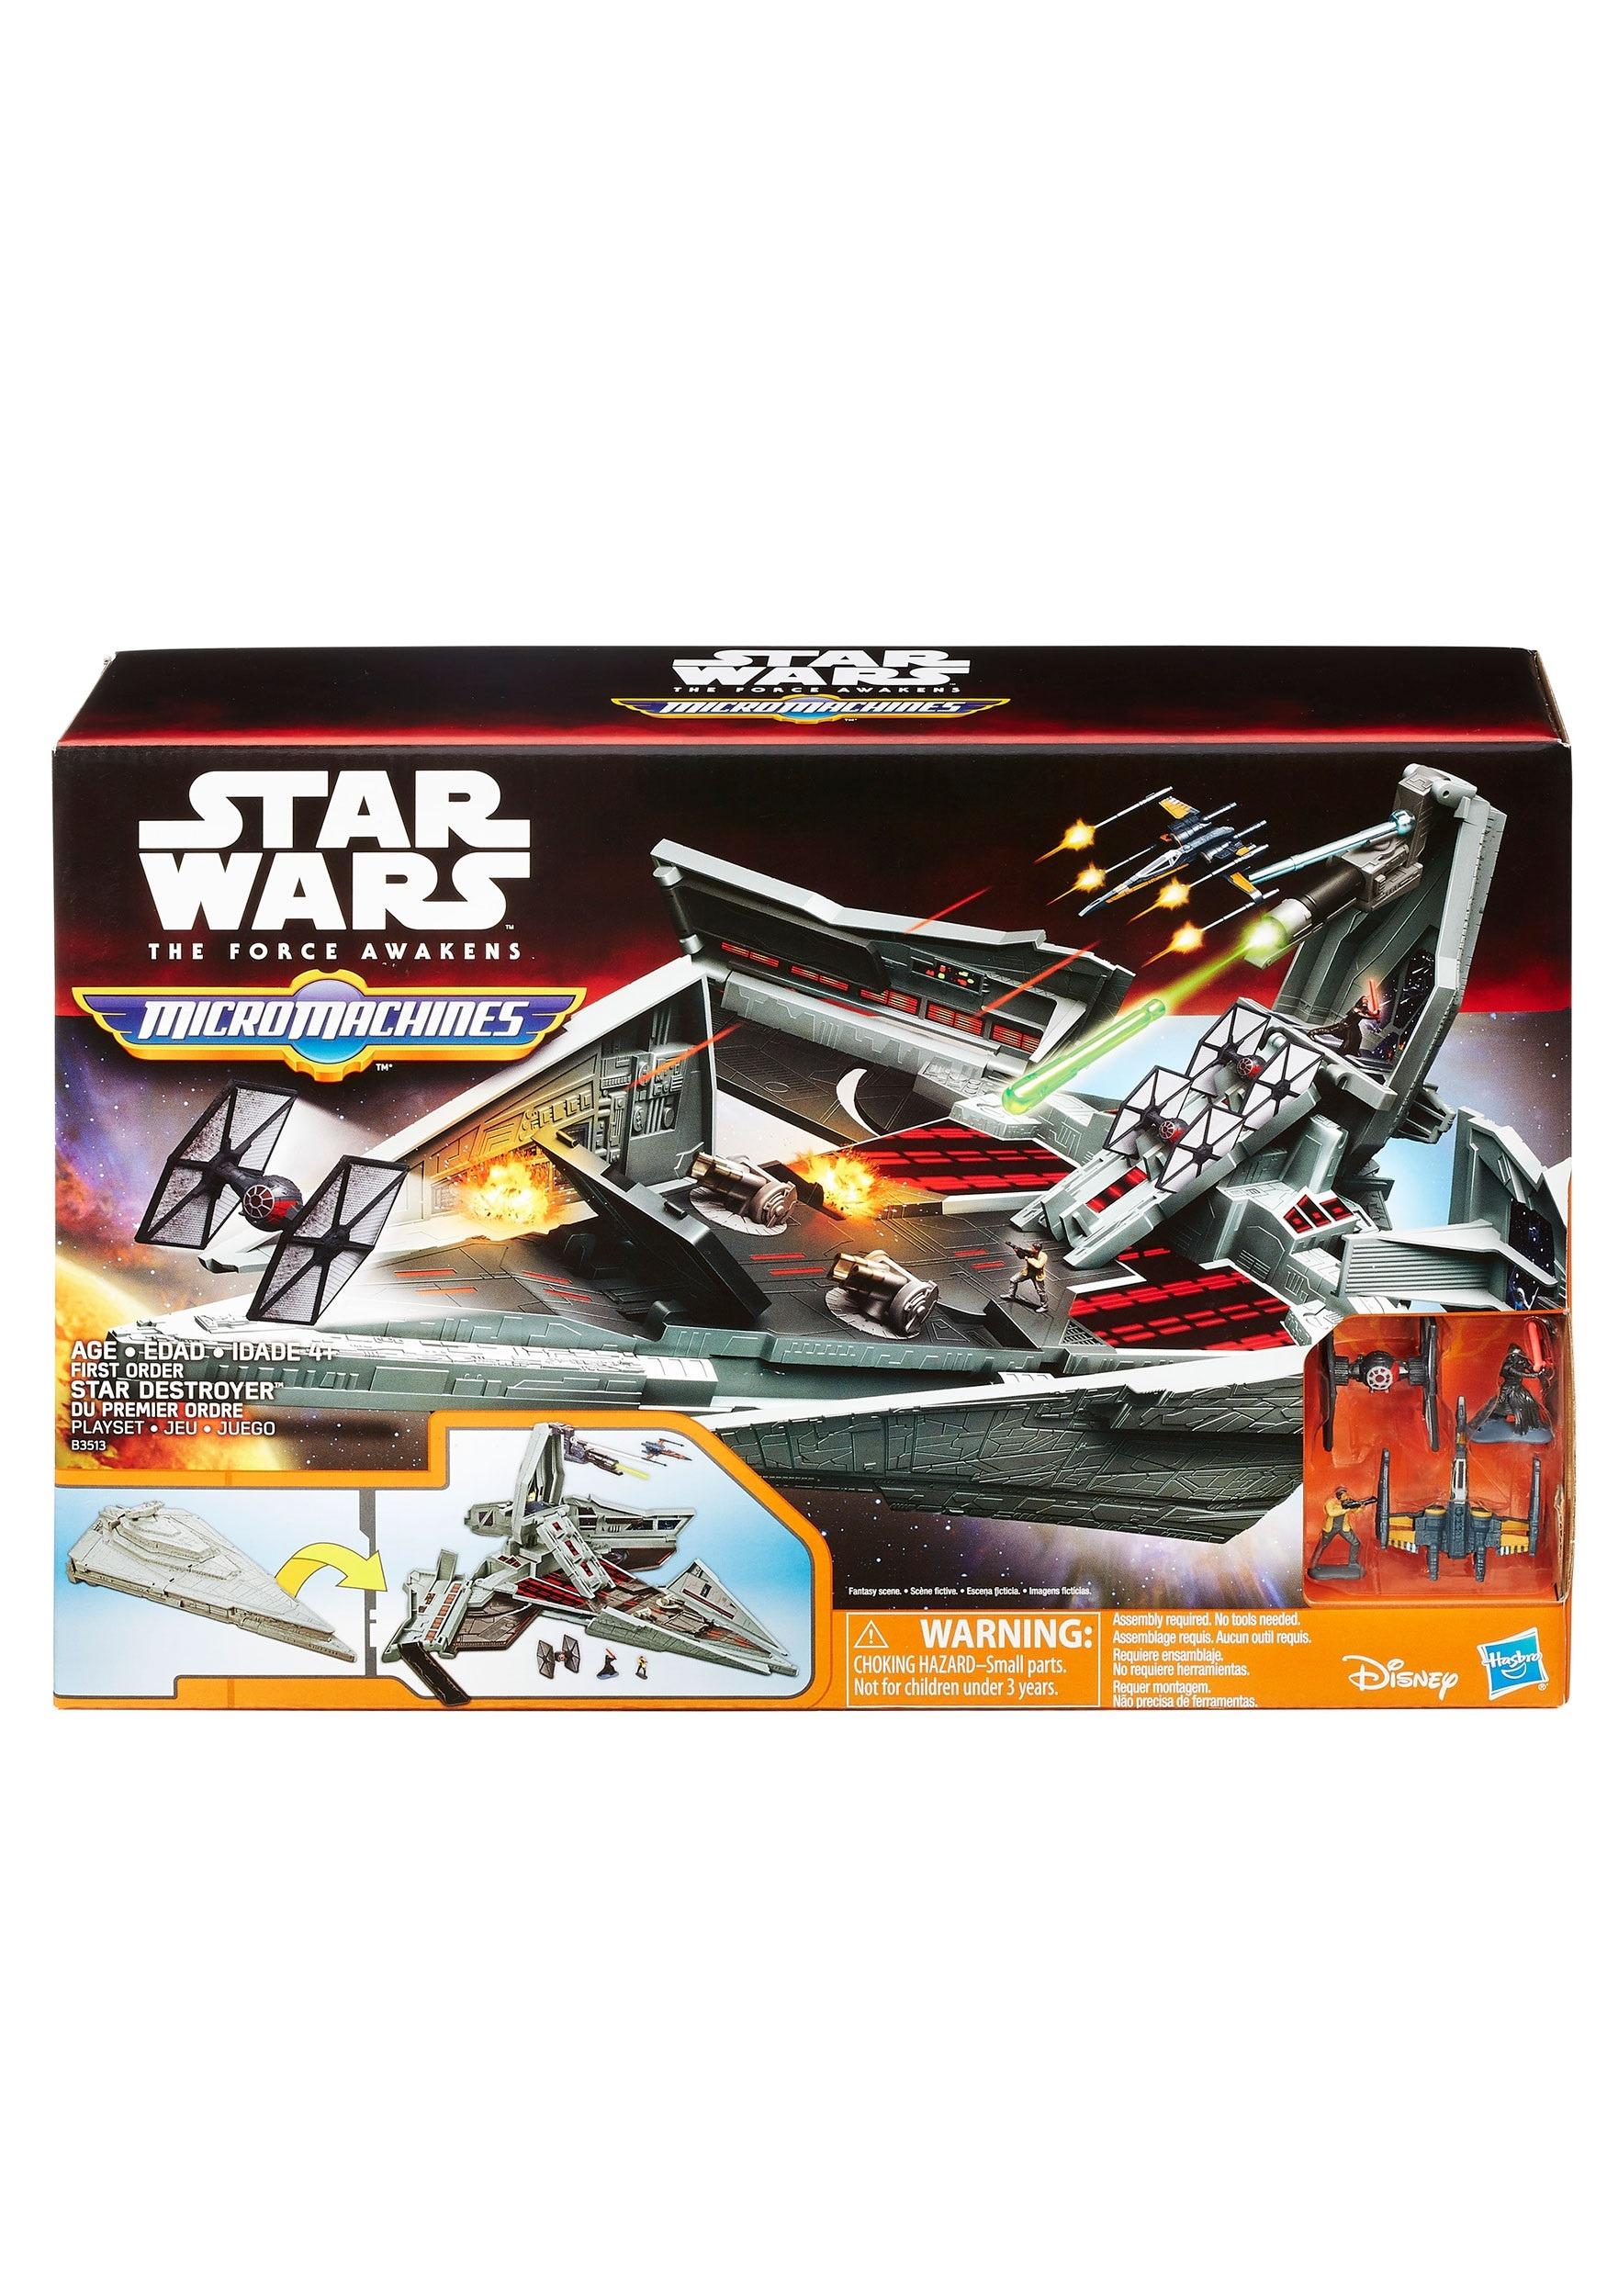 Star Wars Episode 7 First Order Star Destroyer EEDHSB3513